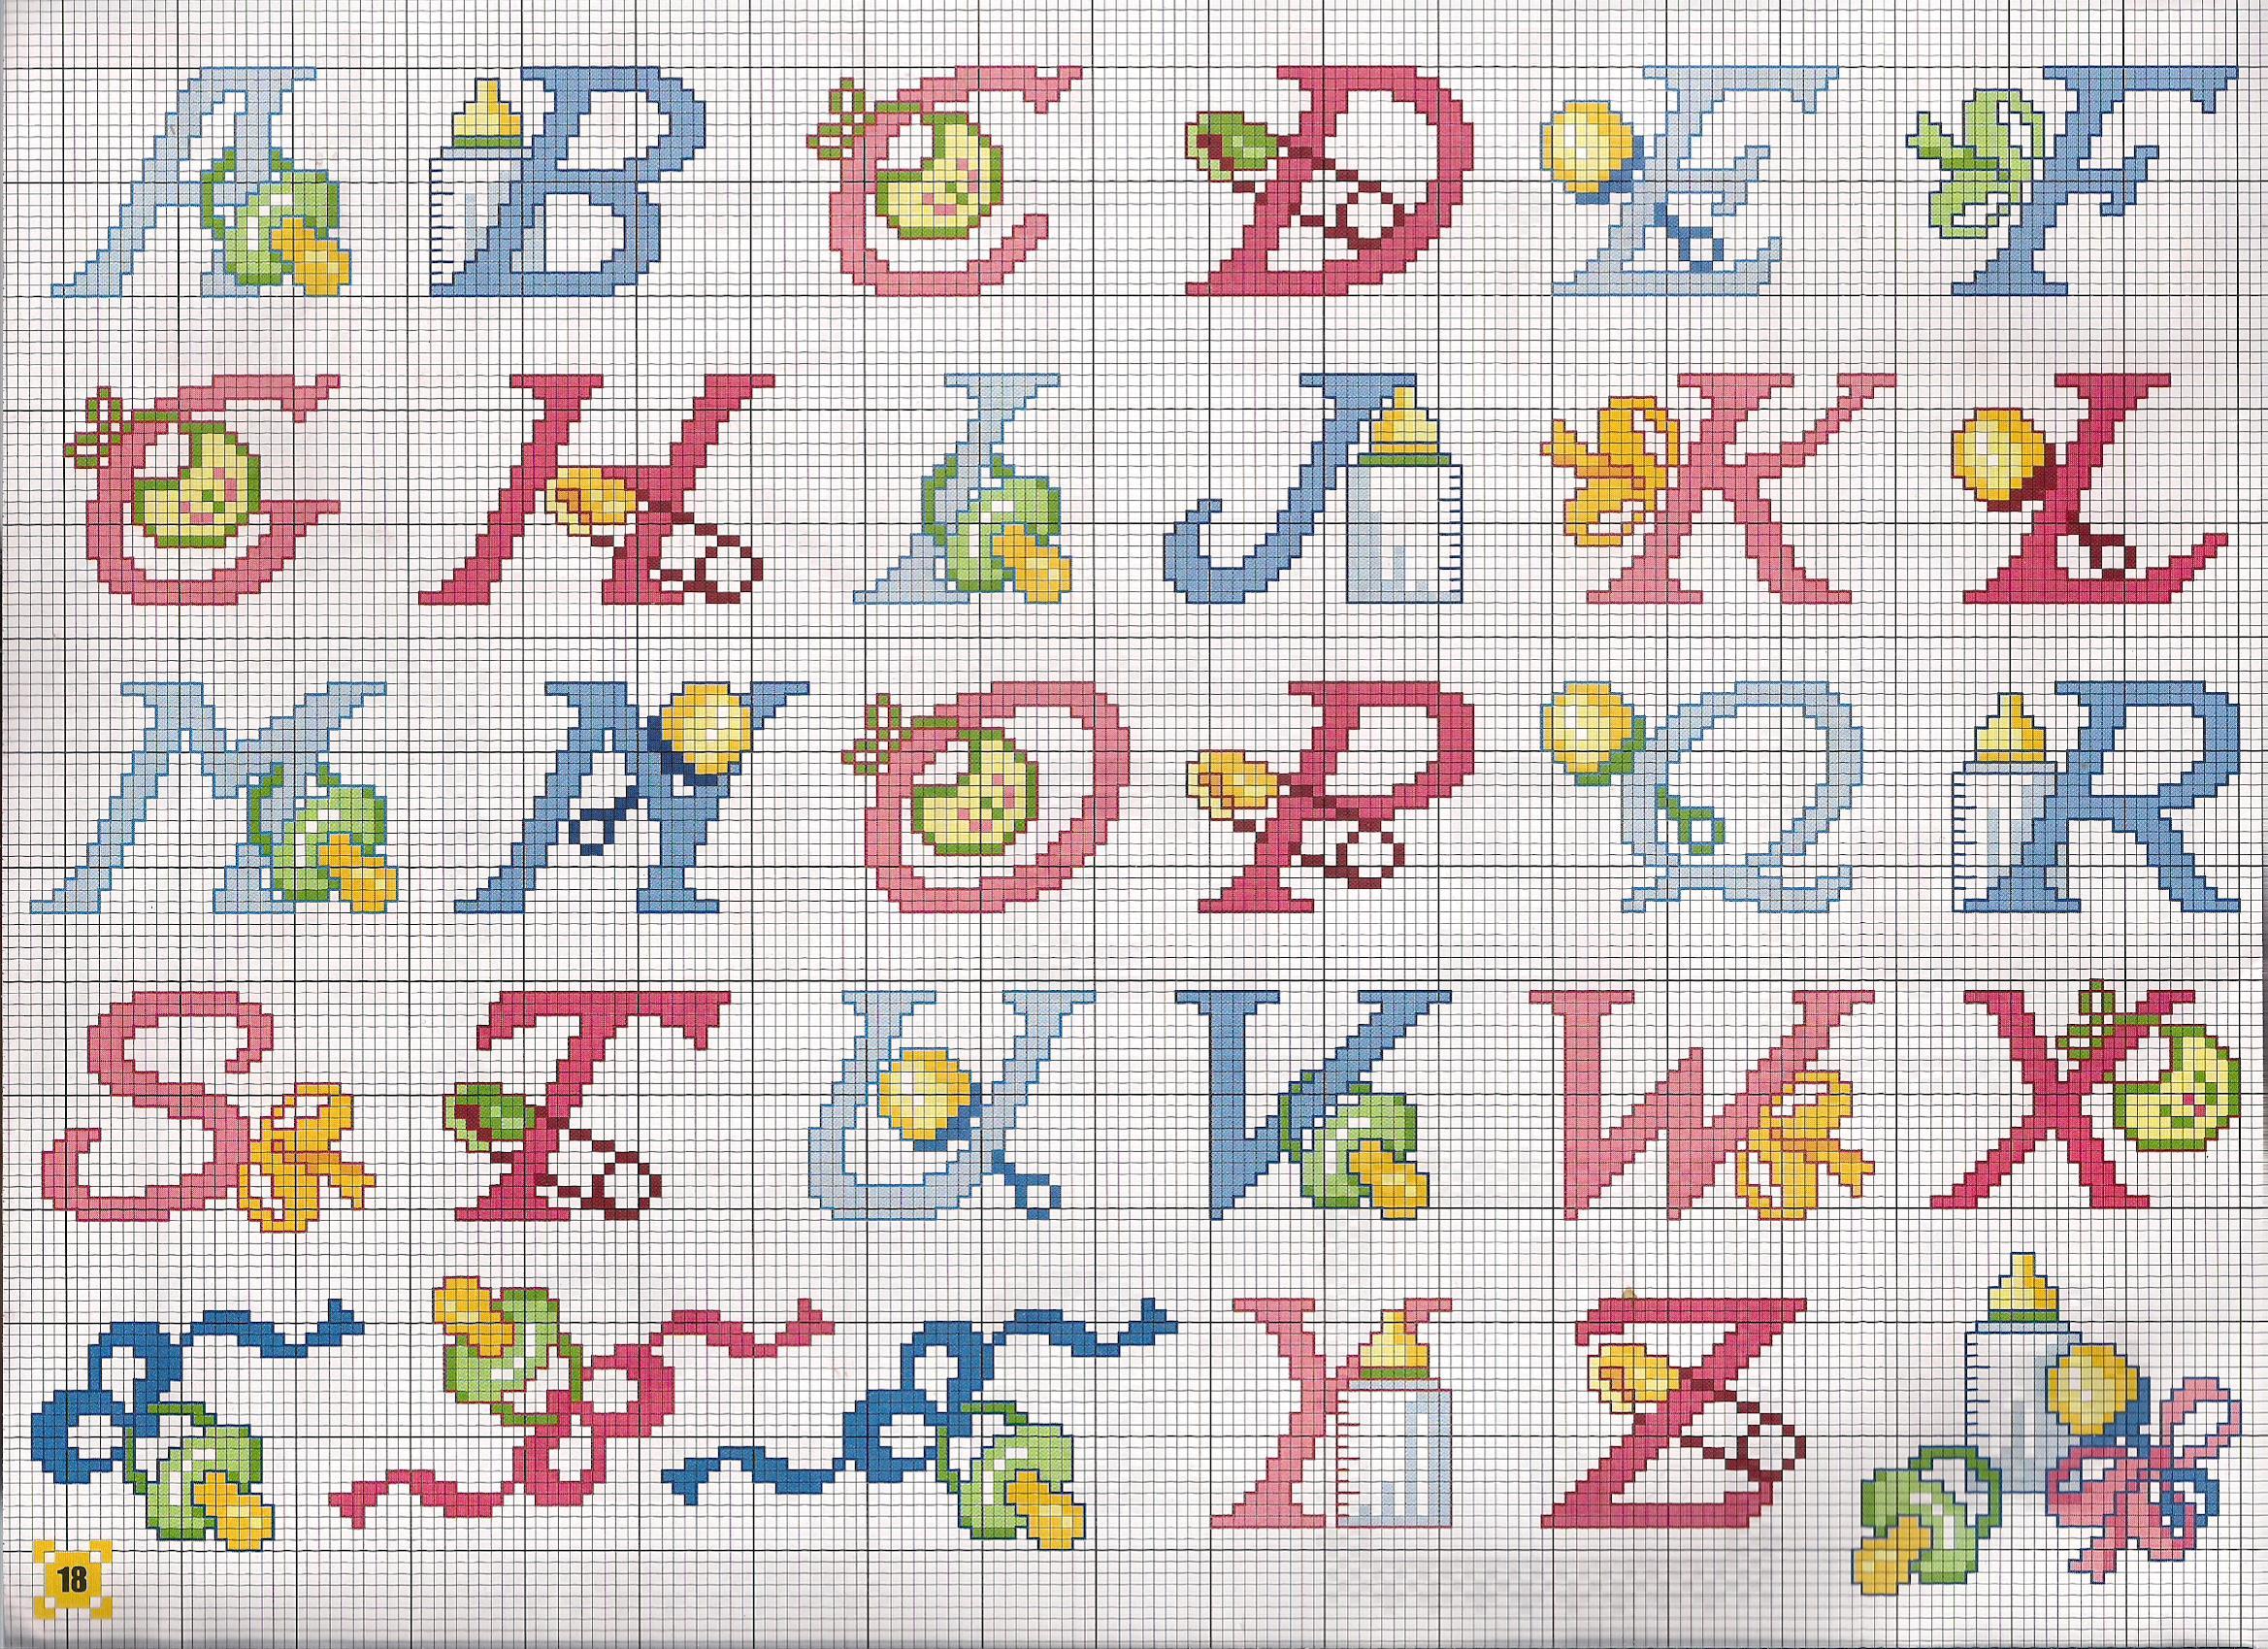 Alfabeto bimbi ciucci biberon punto croce for Punto croce bimbi schemi